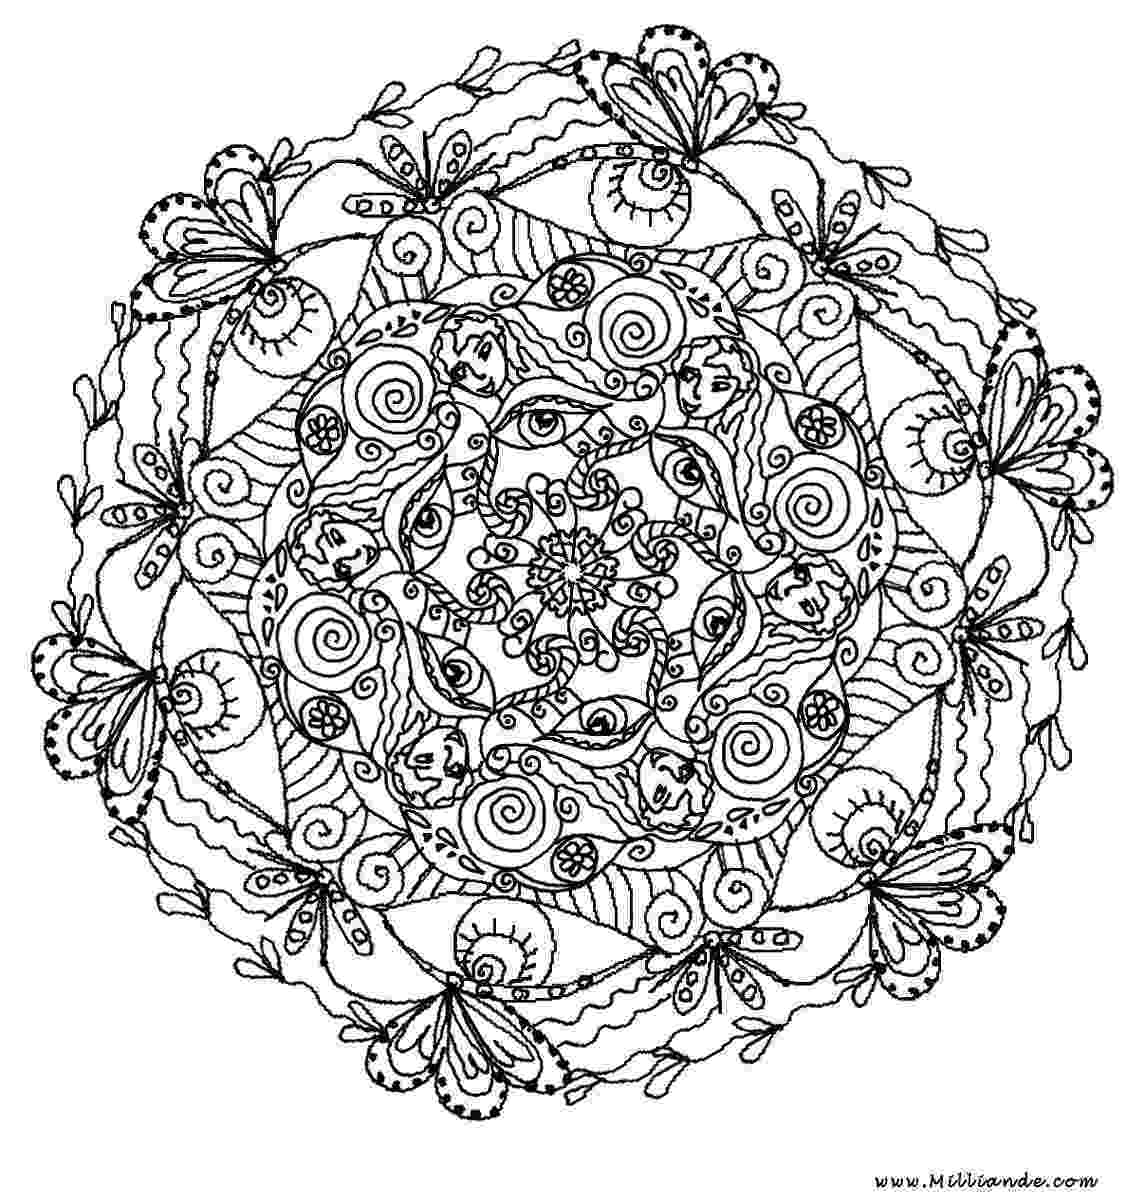 adult mandala coloring pages mindful mandalas juste etre just be pages adult mandala coloring